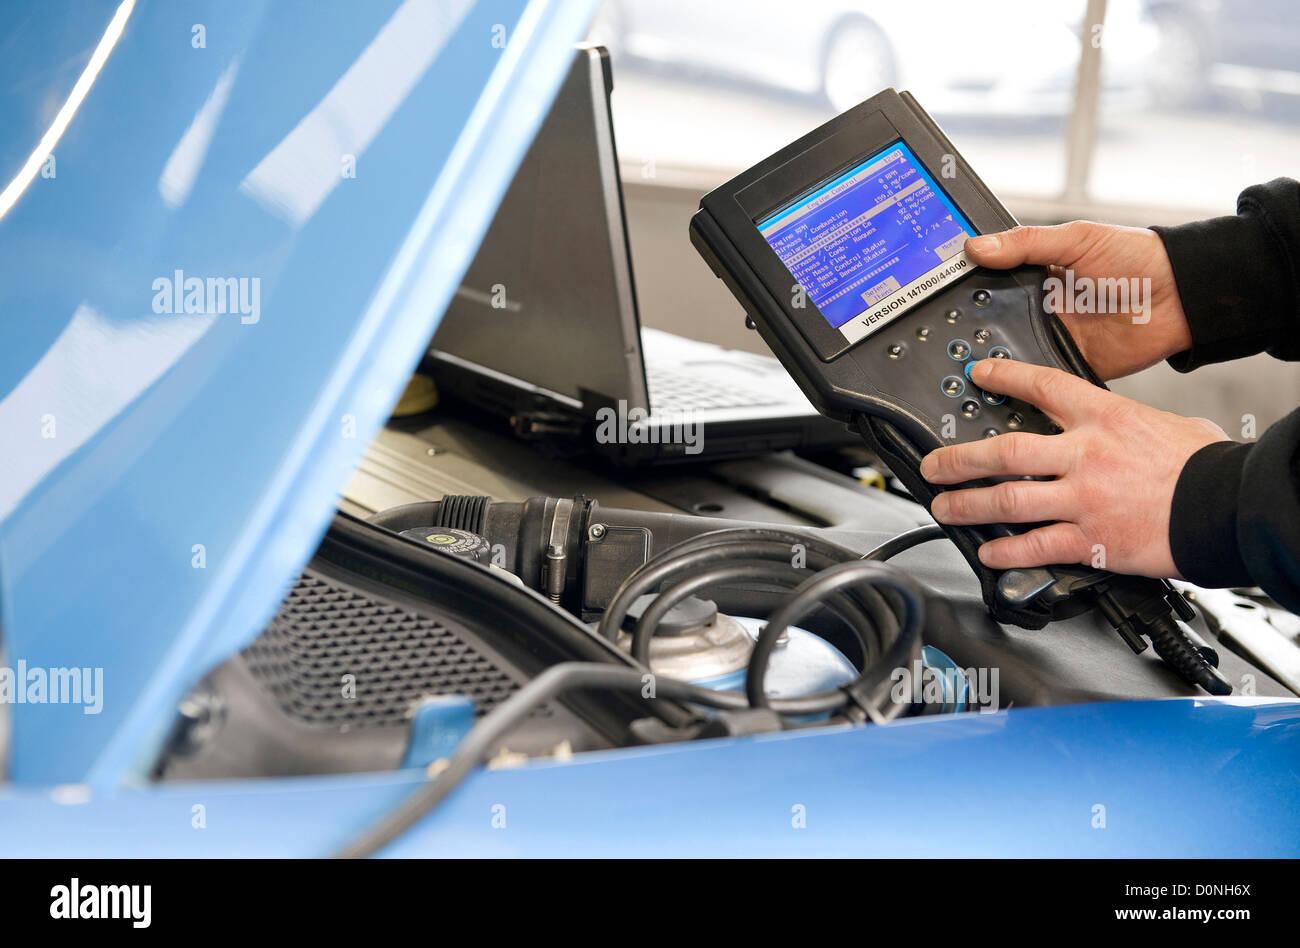 mechanic holding handheld diagnostics machine in garage workshop - Stock Image